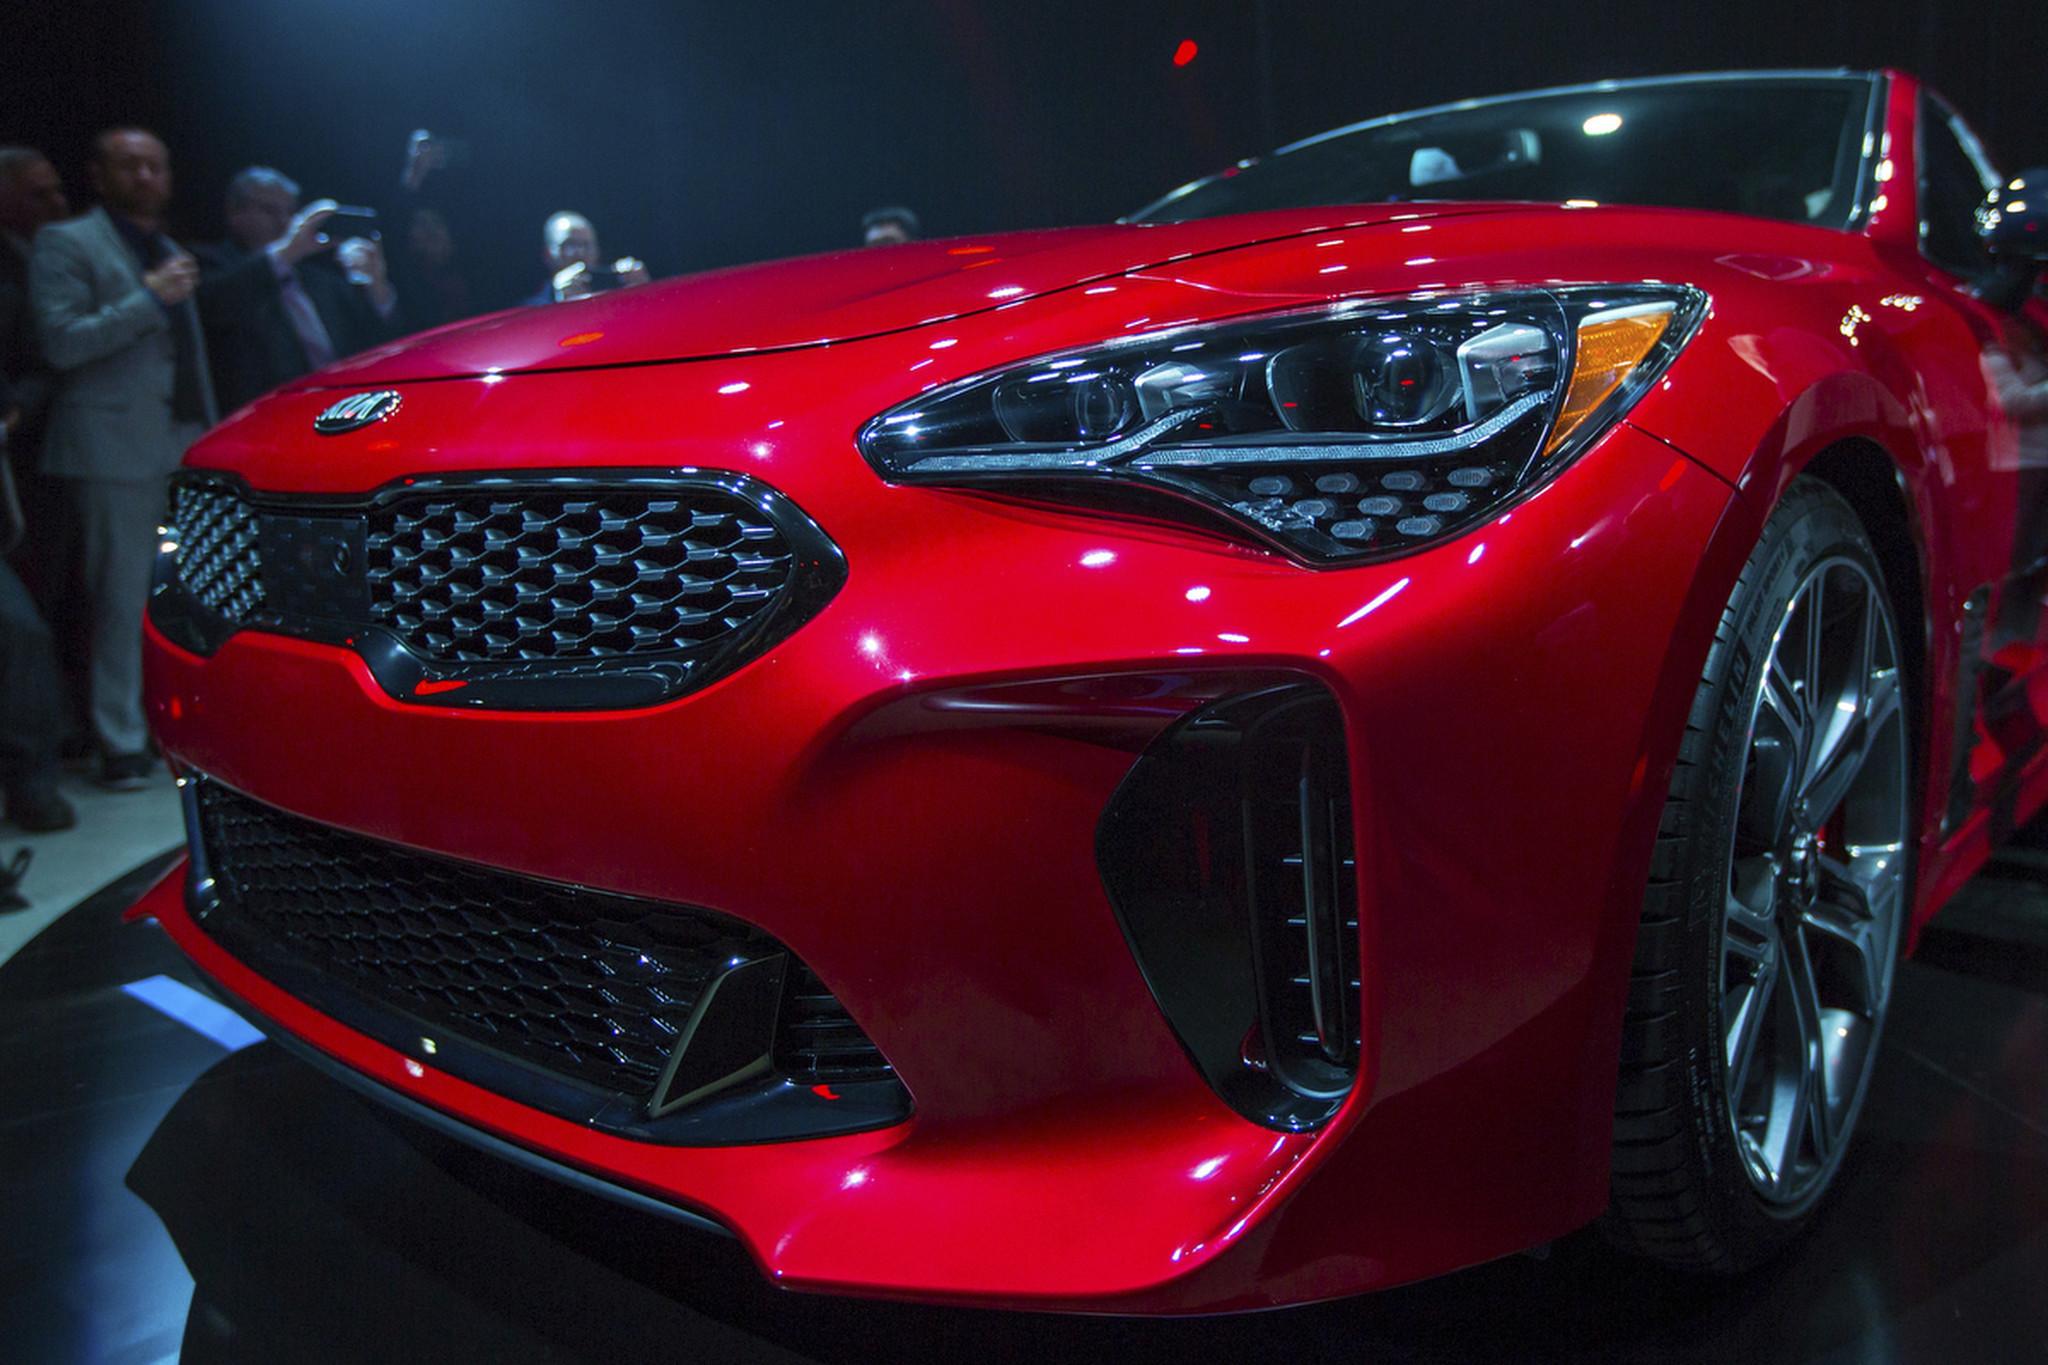 2018 Kia Stinger Fastback Sedan Unveiled In Detroit Chicago Tribune